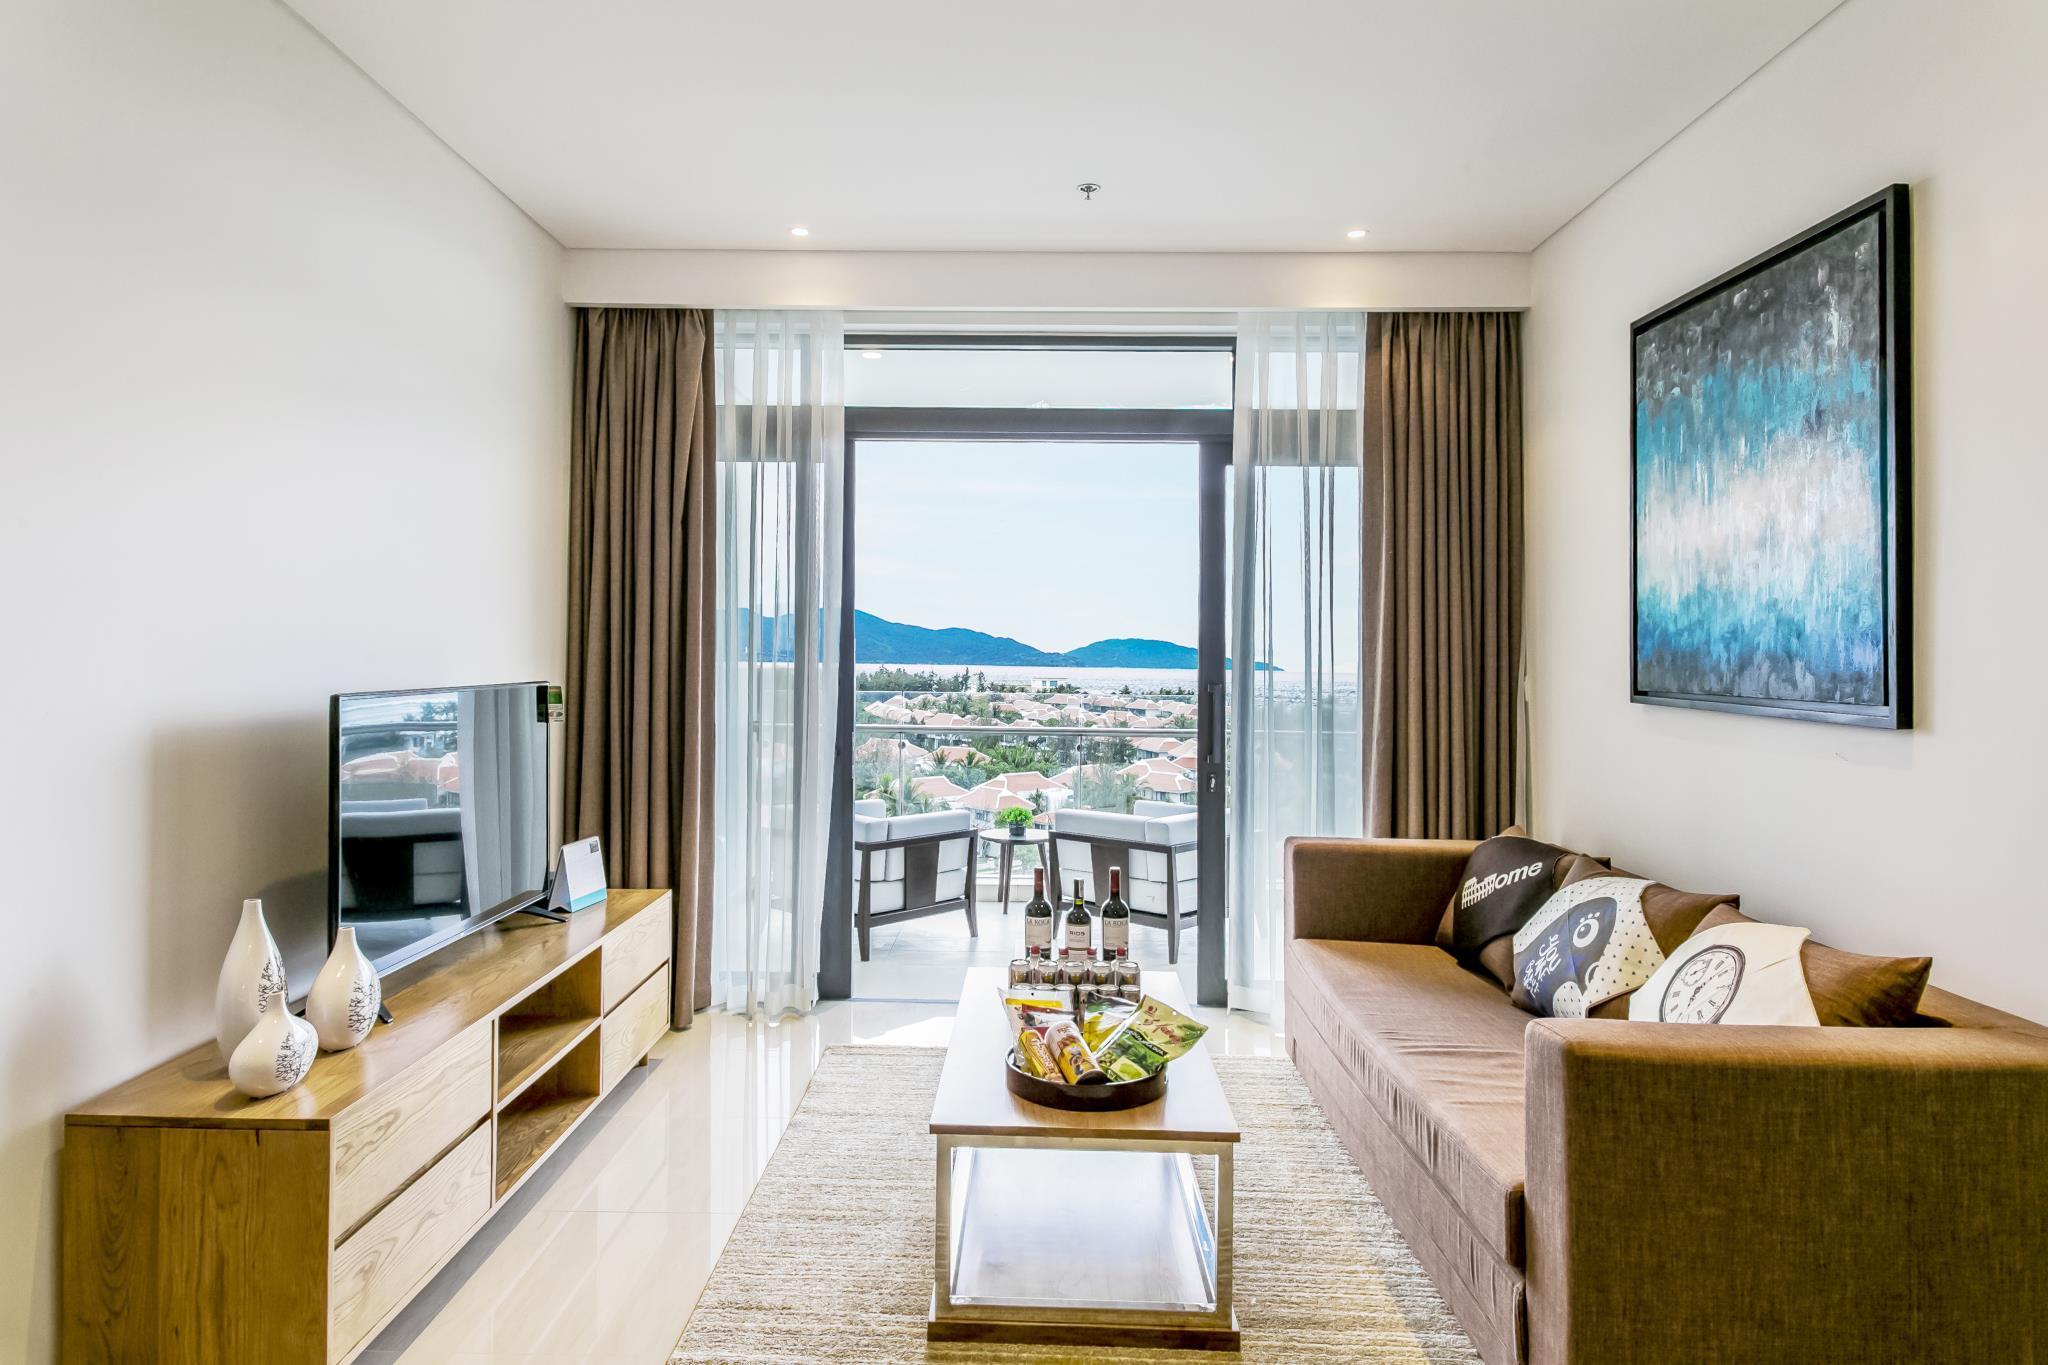 B806 Ocean Apartment 2BR  SABINA Da Nang